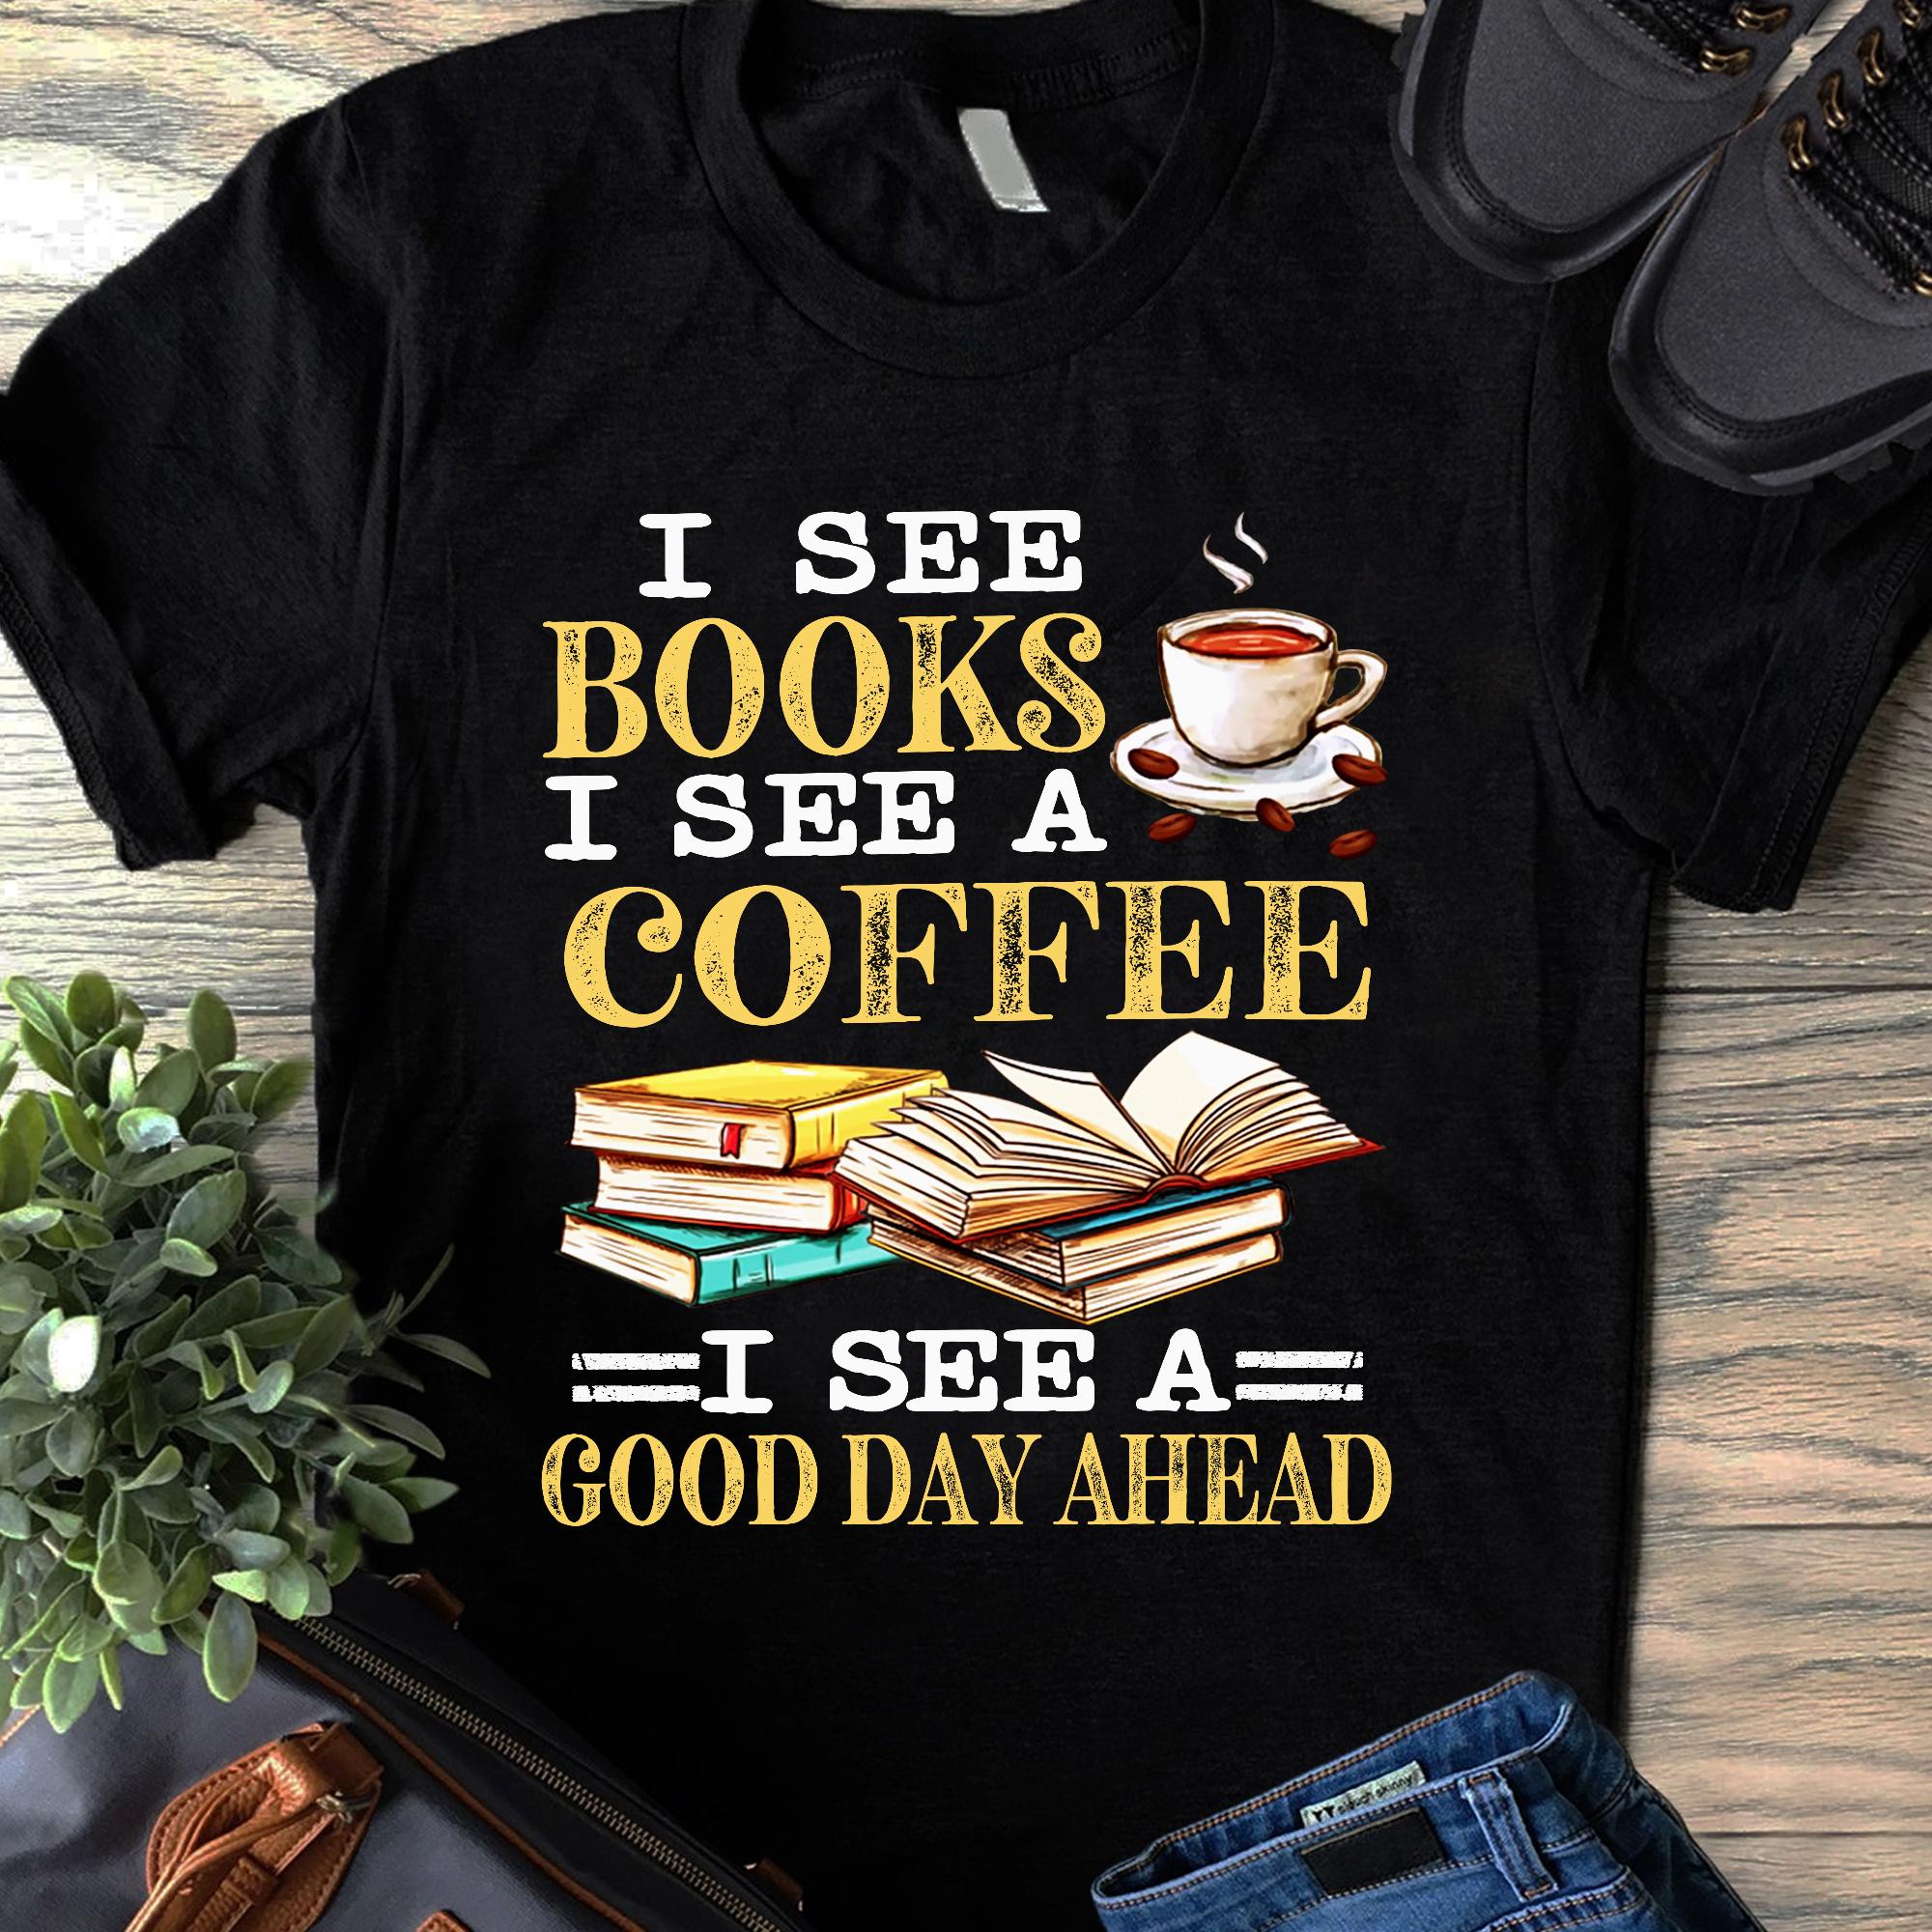 I See Book I See A Coffee Shirt See A Good Day Ahead